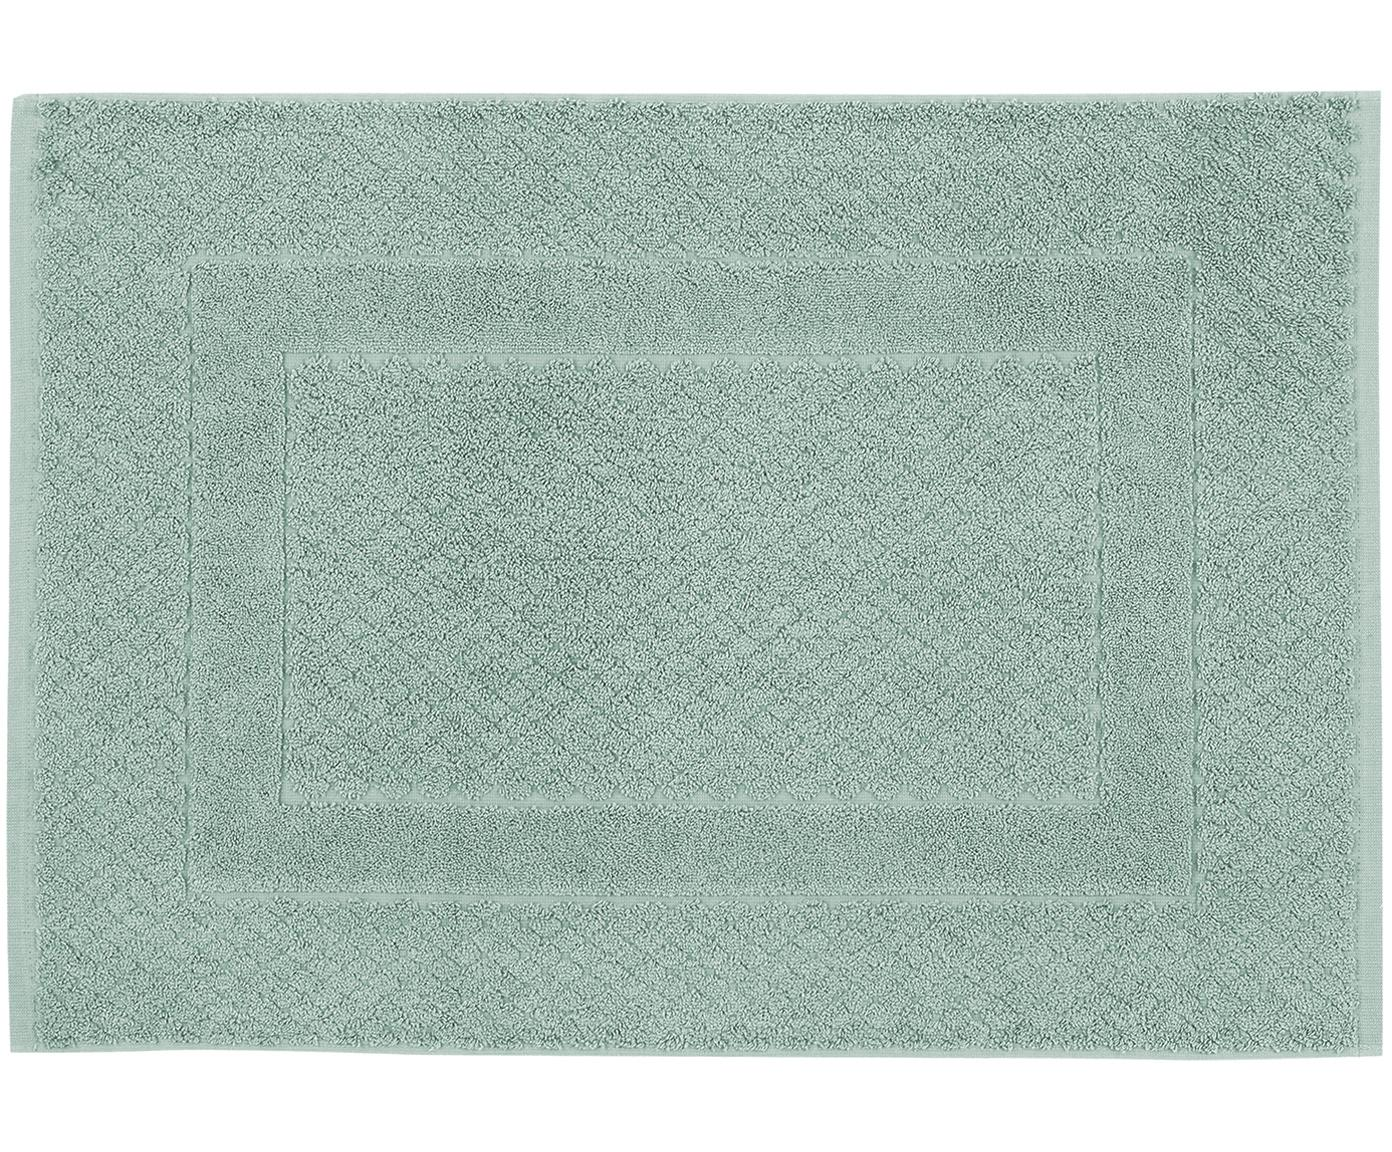 Badmat Katharina, 100% katoen, zware kwaliteit, 900 g/m², Mintgroen, 50 x 70 cm